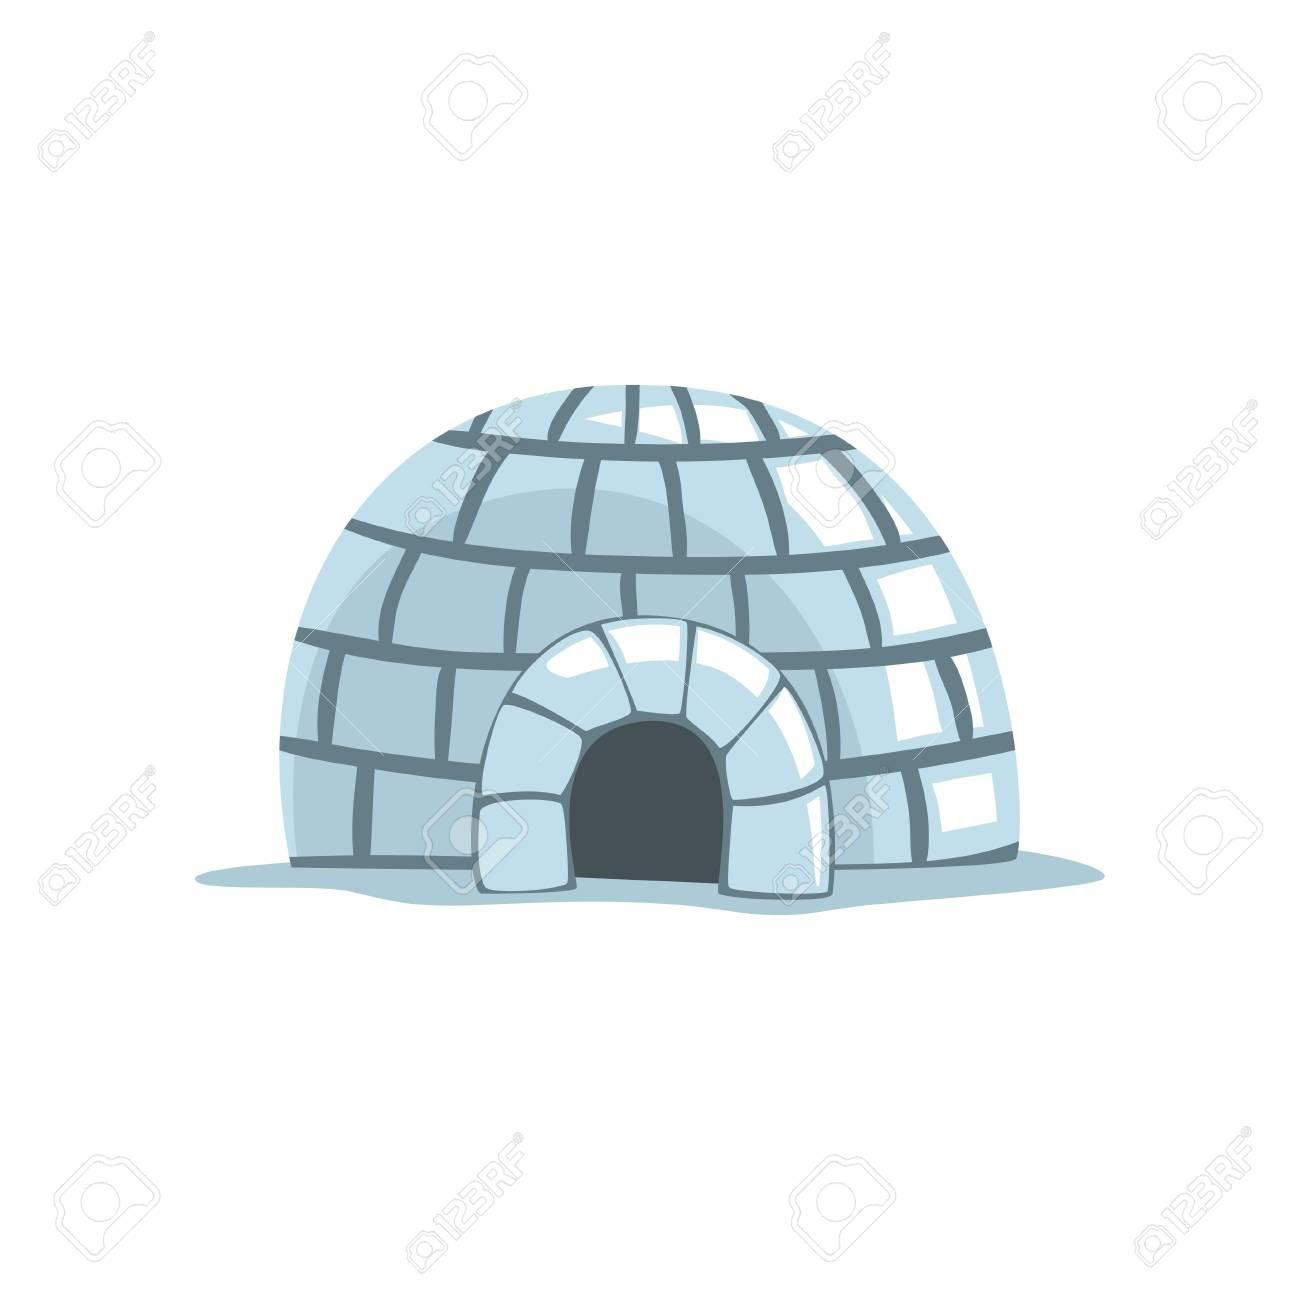 Igloo, eskimo house vector Illustration on a white background - 104333597